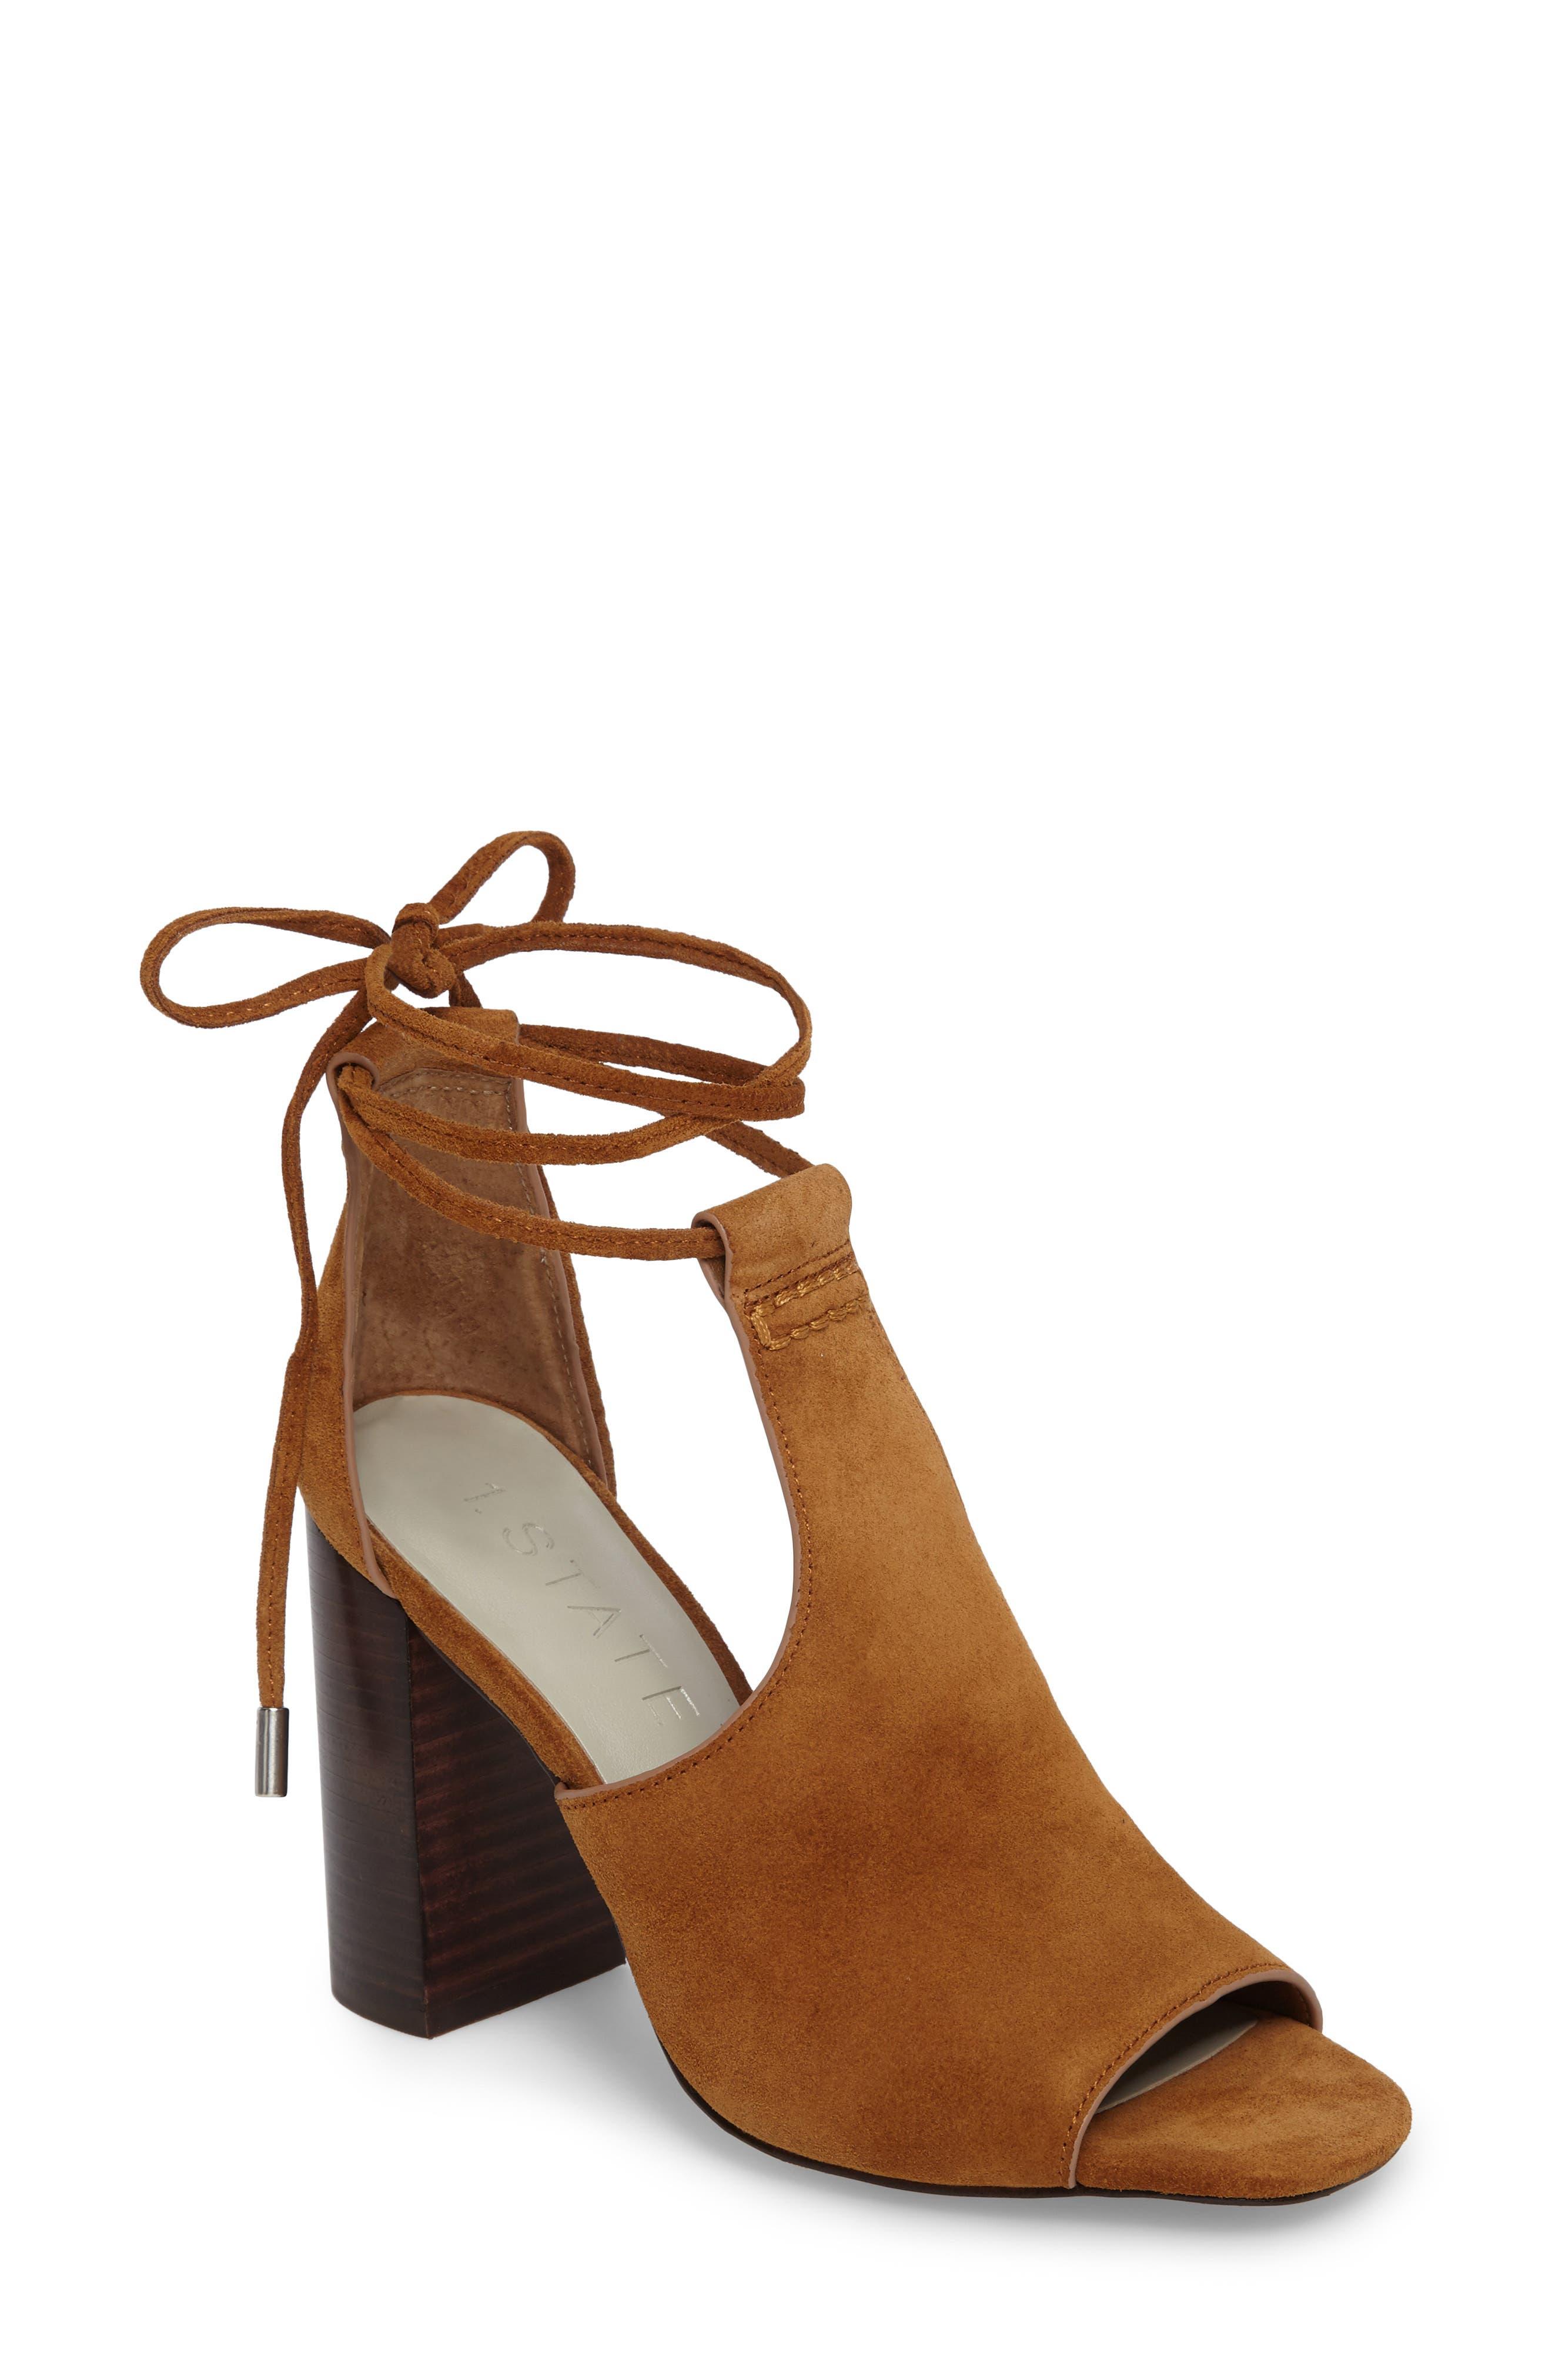 Alternate Image 1 Selected - 1.STATE Tilya Bootie Profile Sandal (Women)